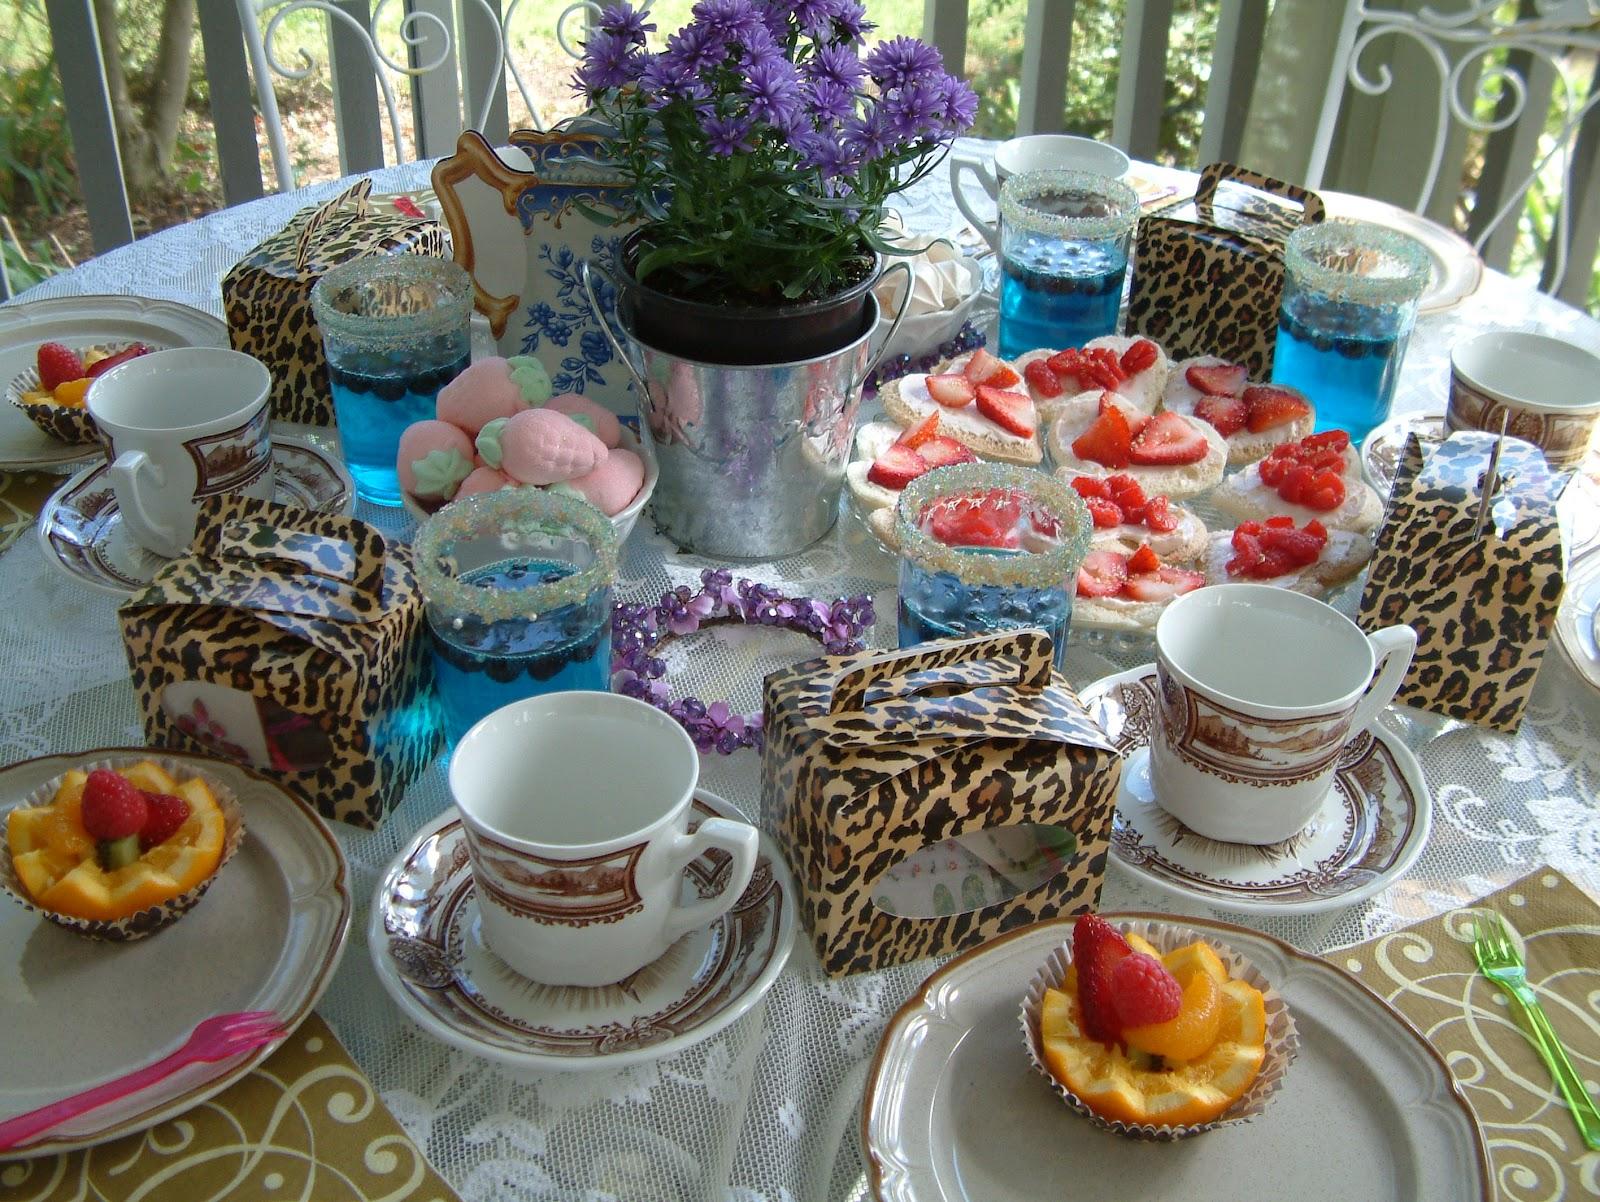 Tea Party Table Settings Ideas : Aprils Country Life: Tea Party Table Settings - For the Girls